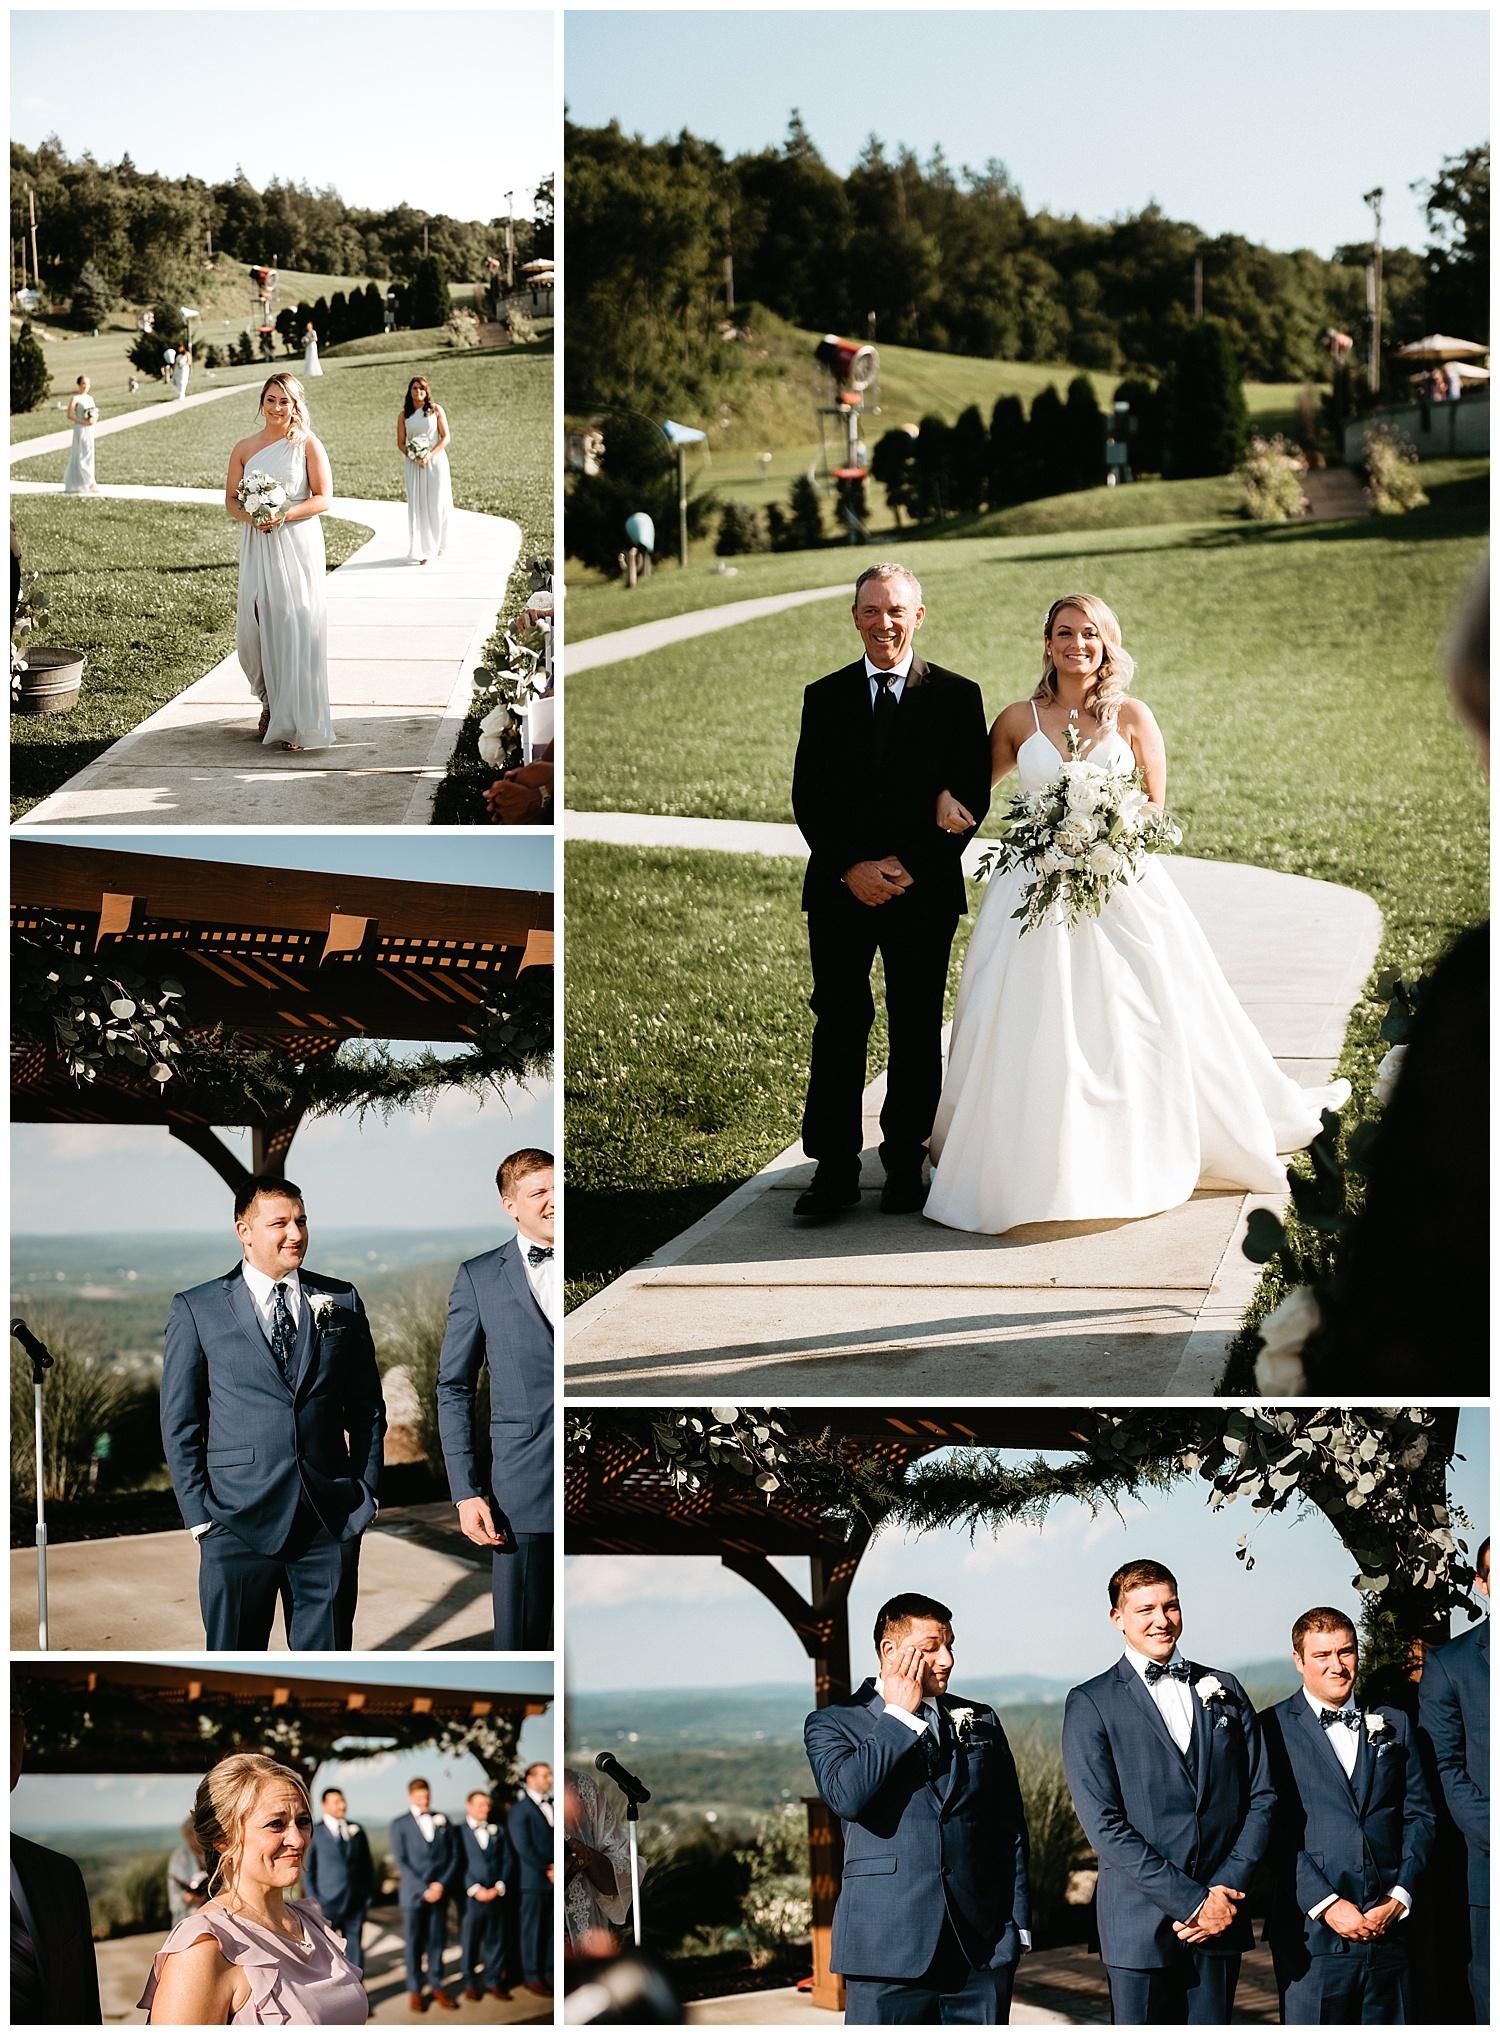 Destination-Wedding-Photographer-in-NEPA-Palmerton-PA_0018.jpg